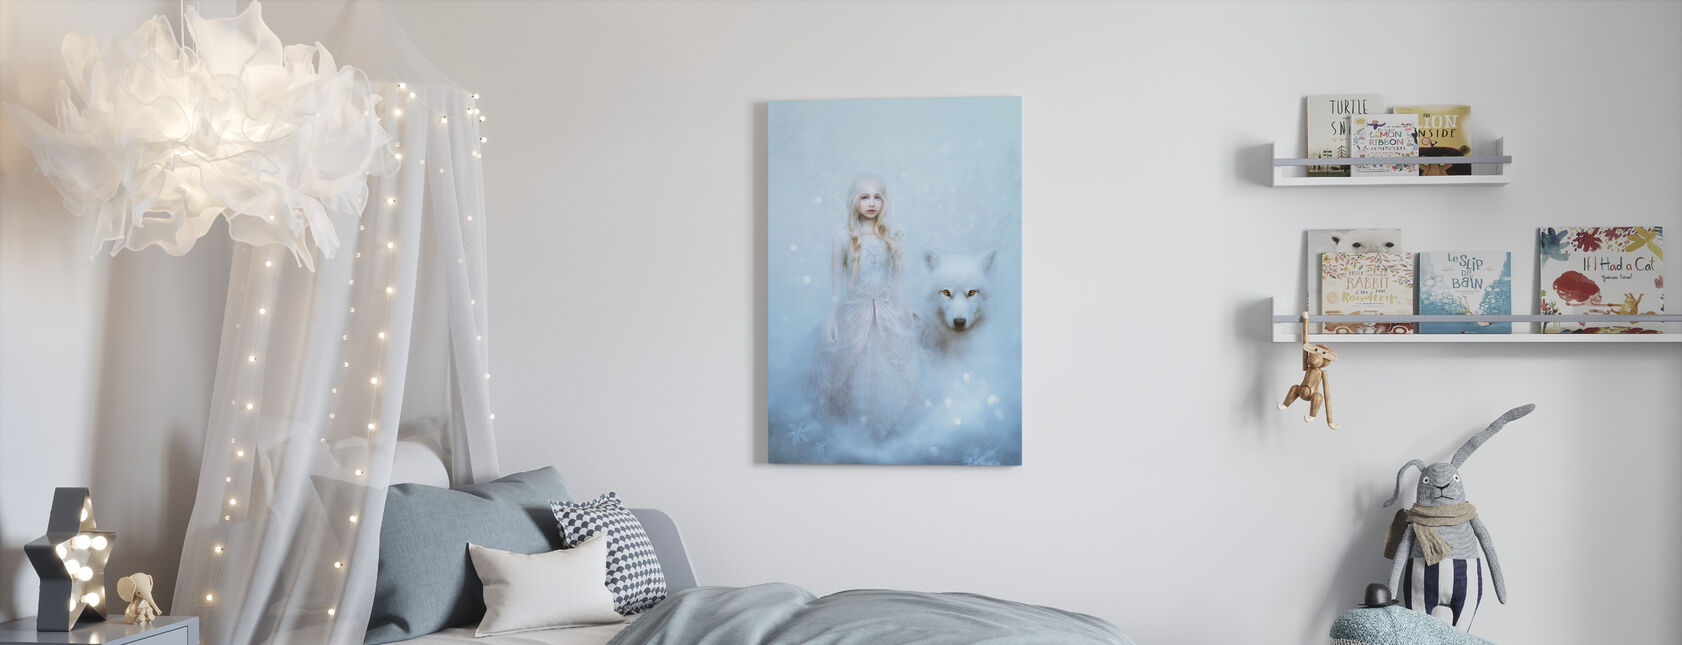 Sneeuwprinses - Canvas print - Kinderkamer